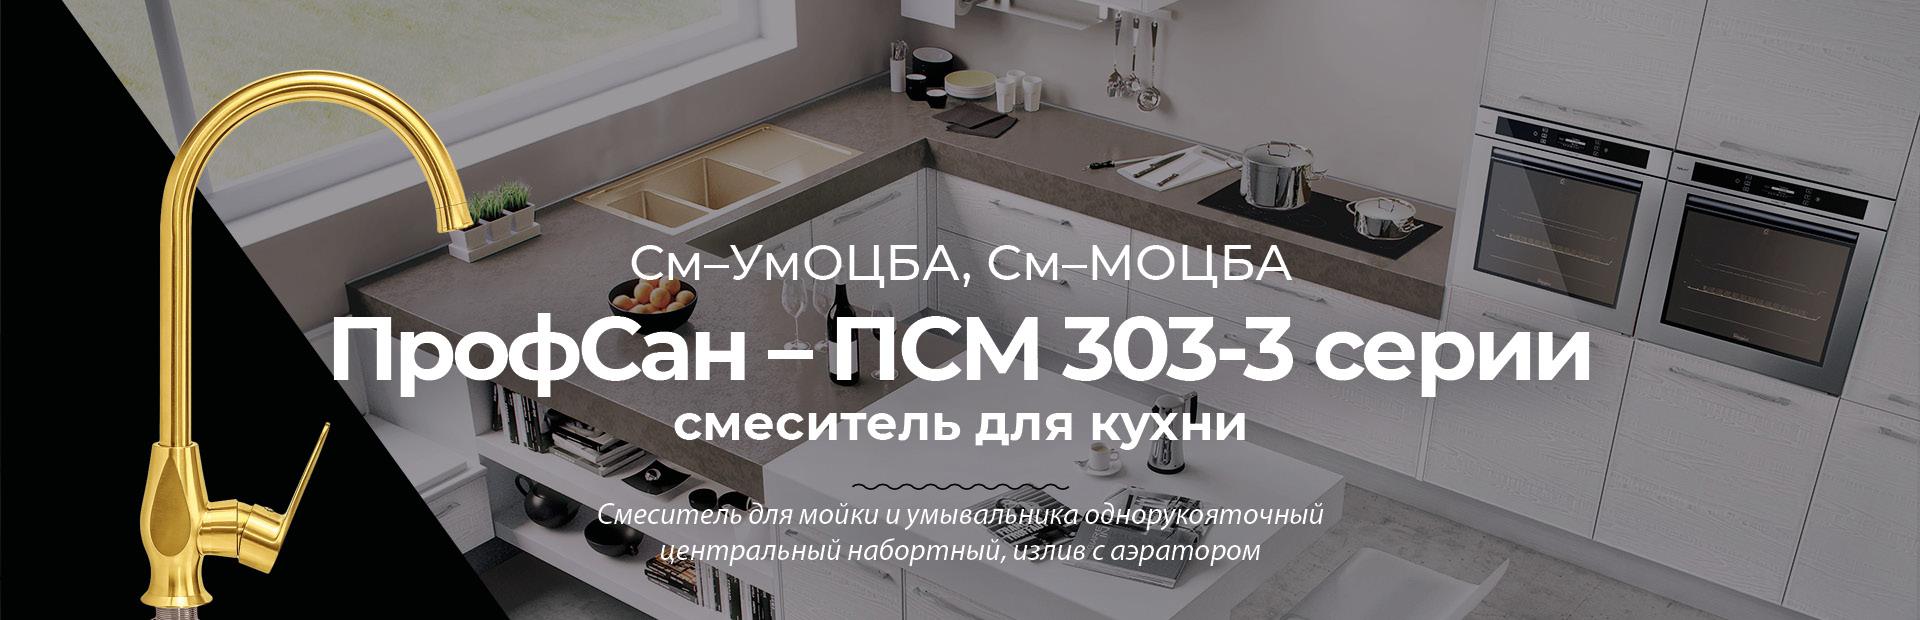 Баннер со смесителем Профсан ПСМ 303-3